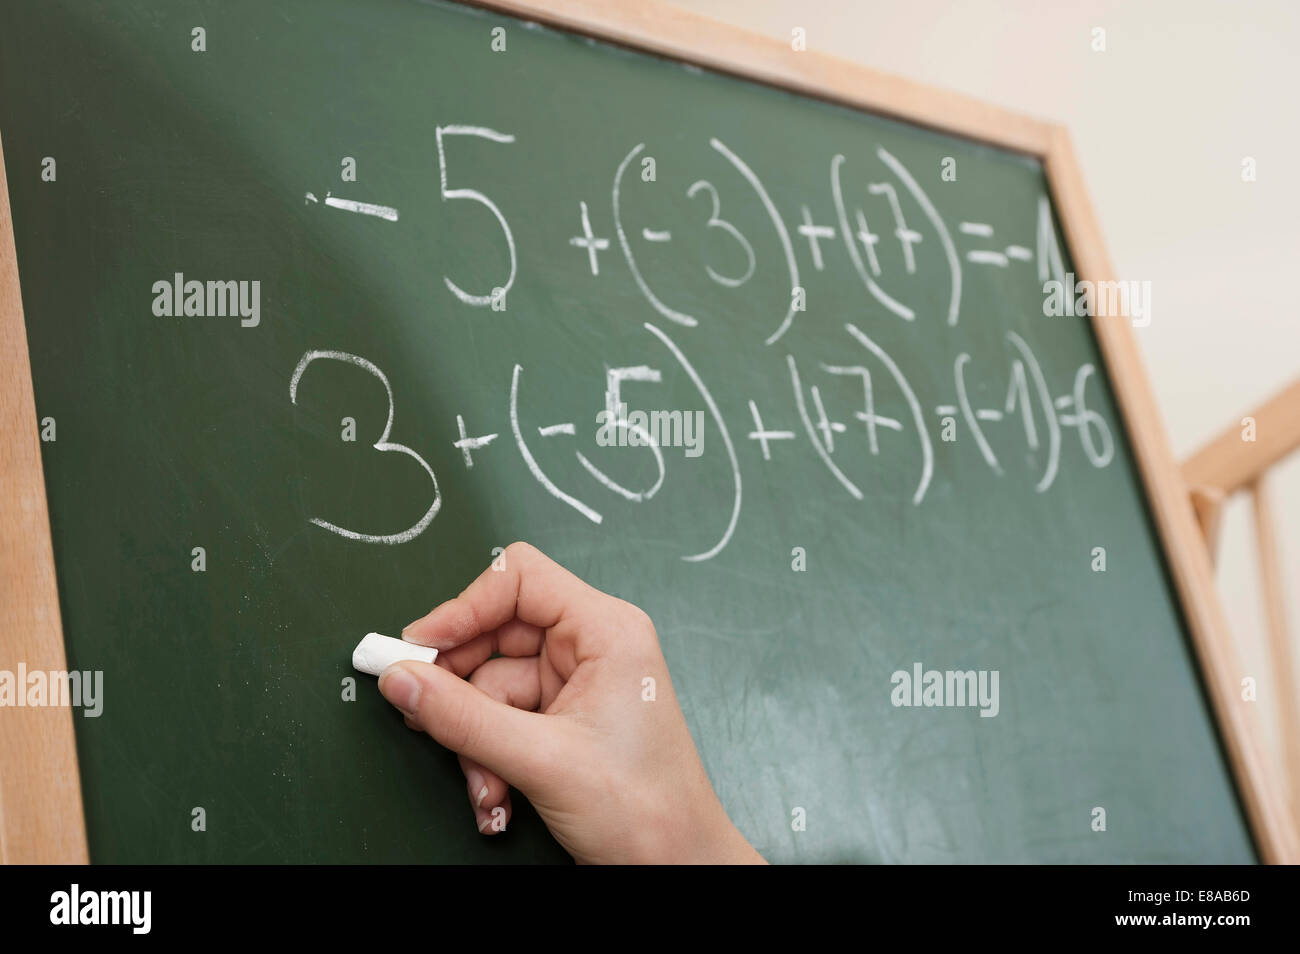 Girl writing arithmetic problem on blackboard - Stock Image